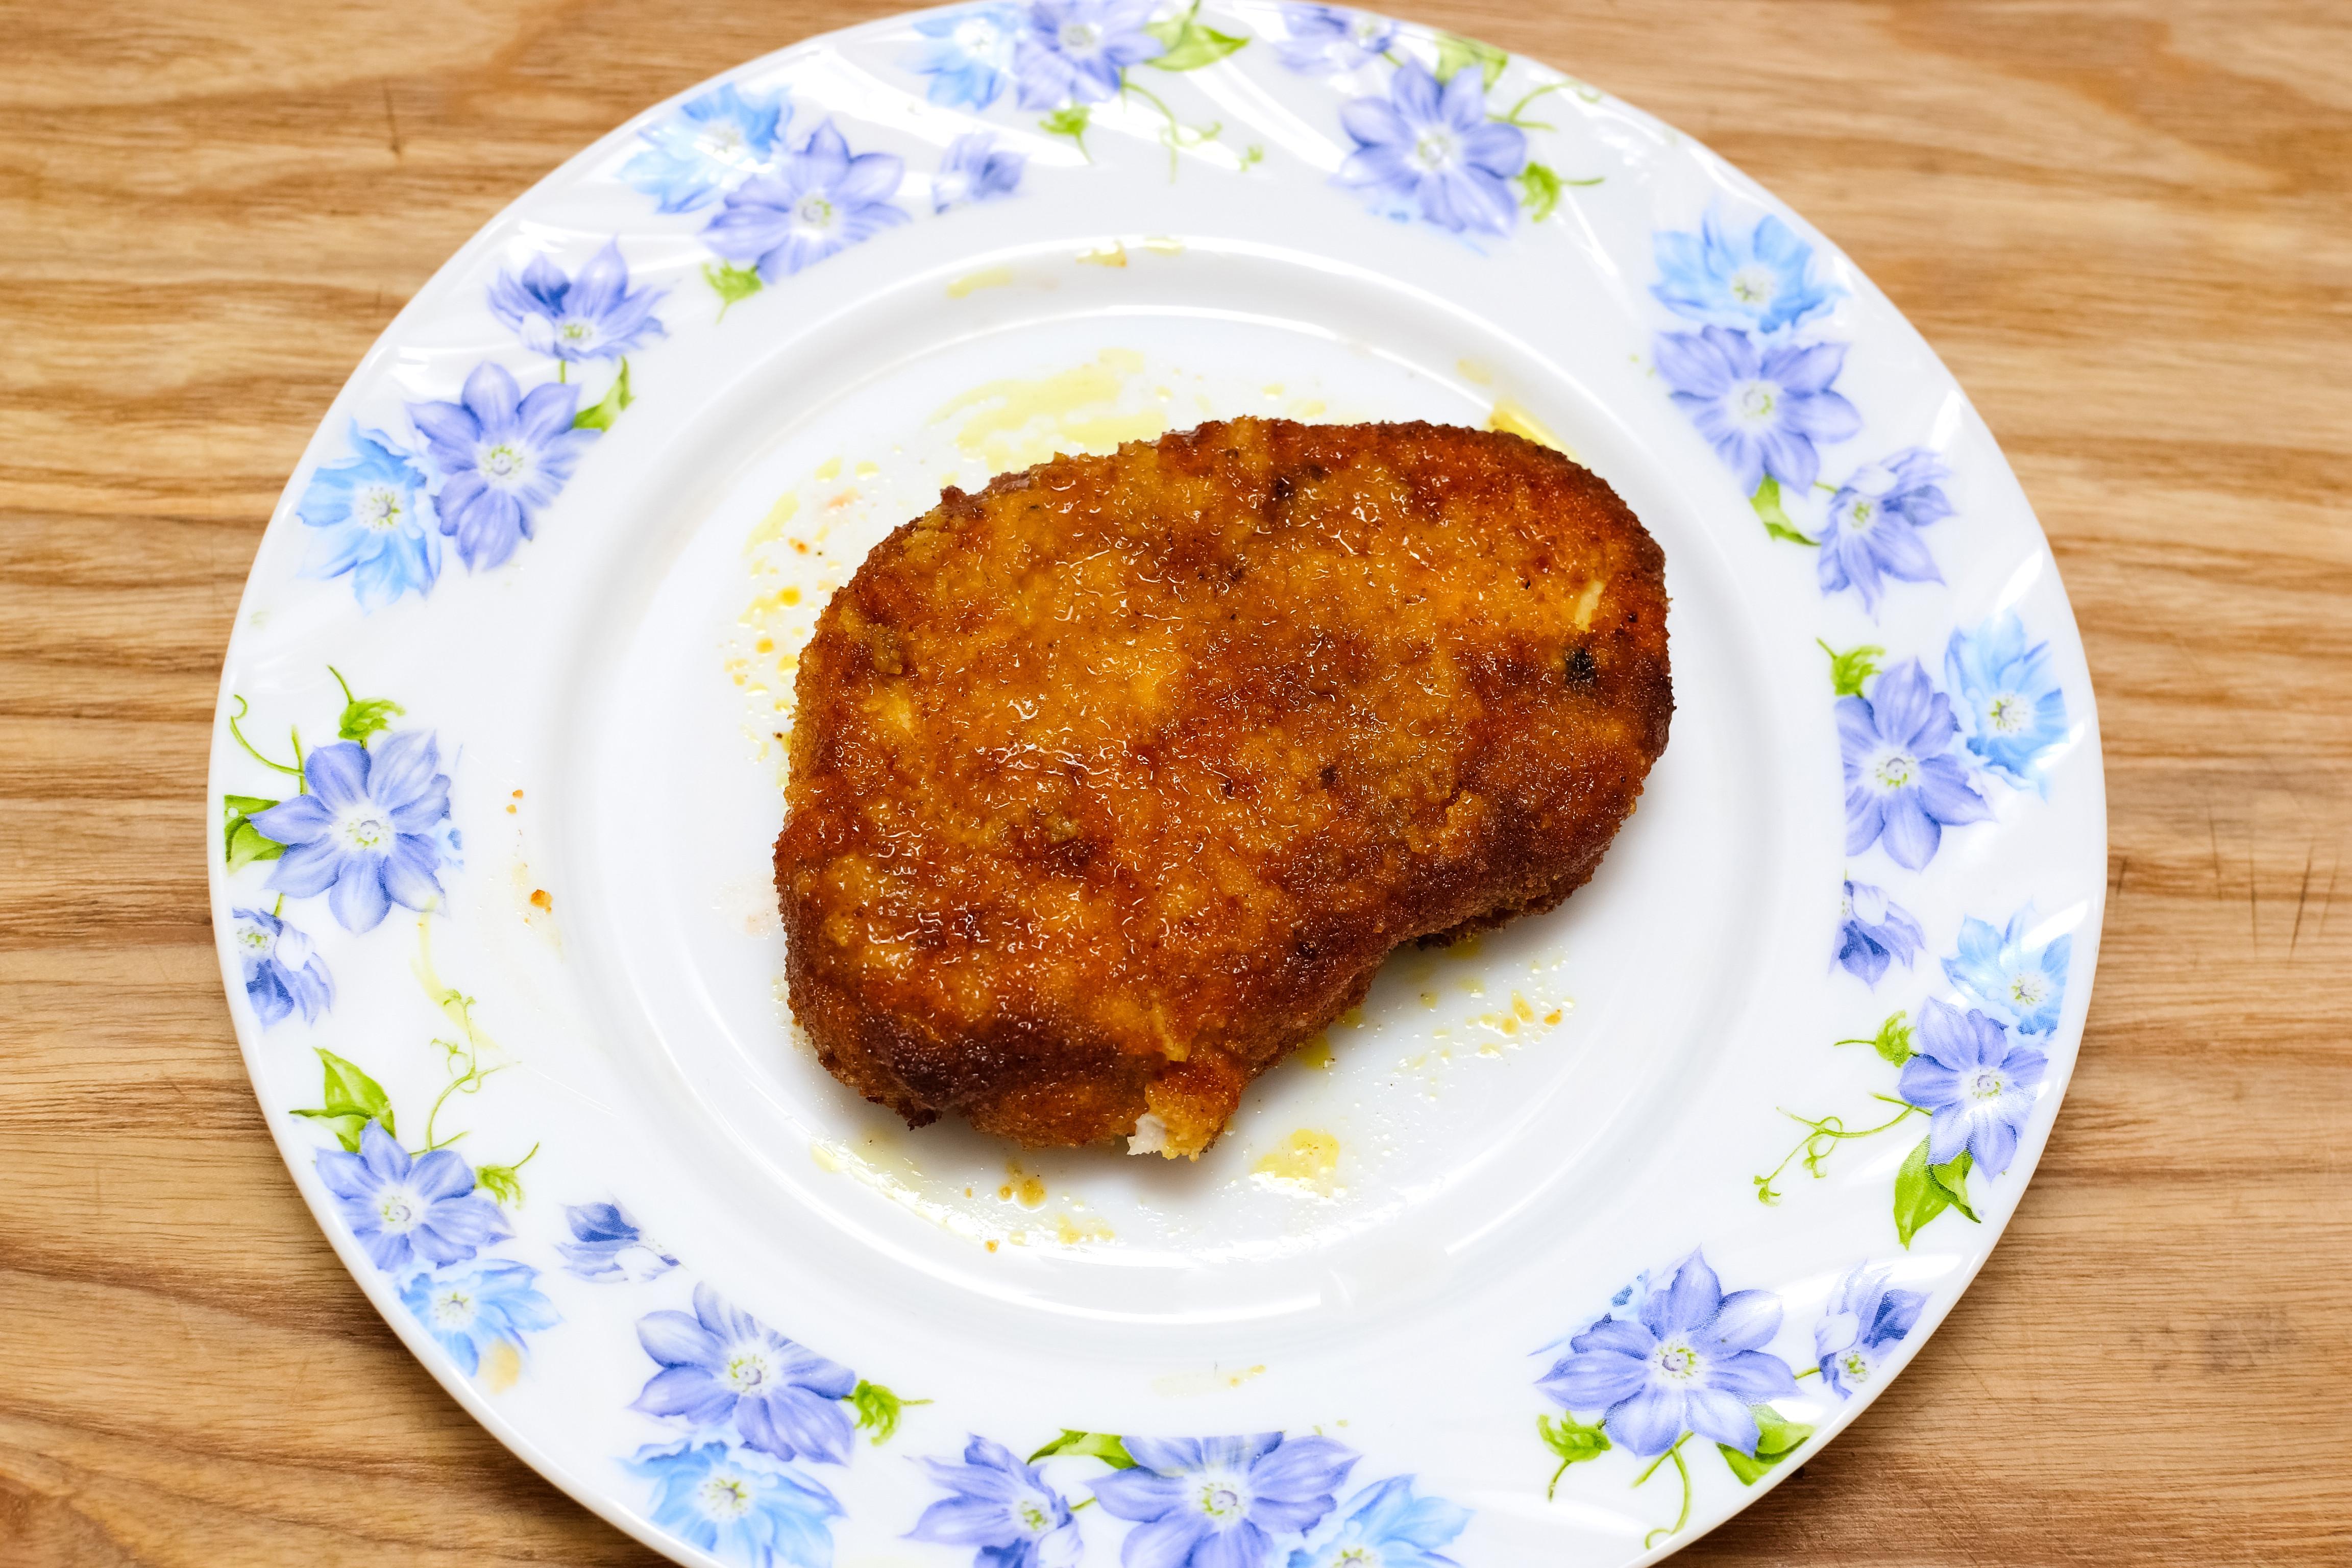 Ways To Cook Pork Chops  4 Ways to Cook Boneless Pork Chops wikiHow